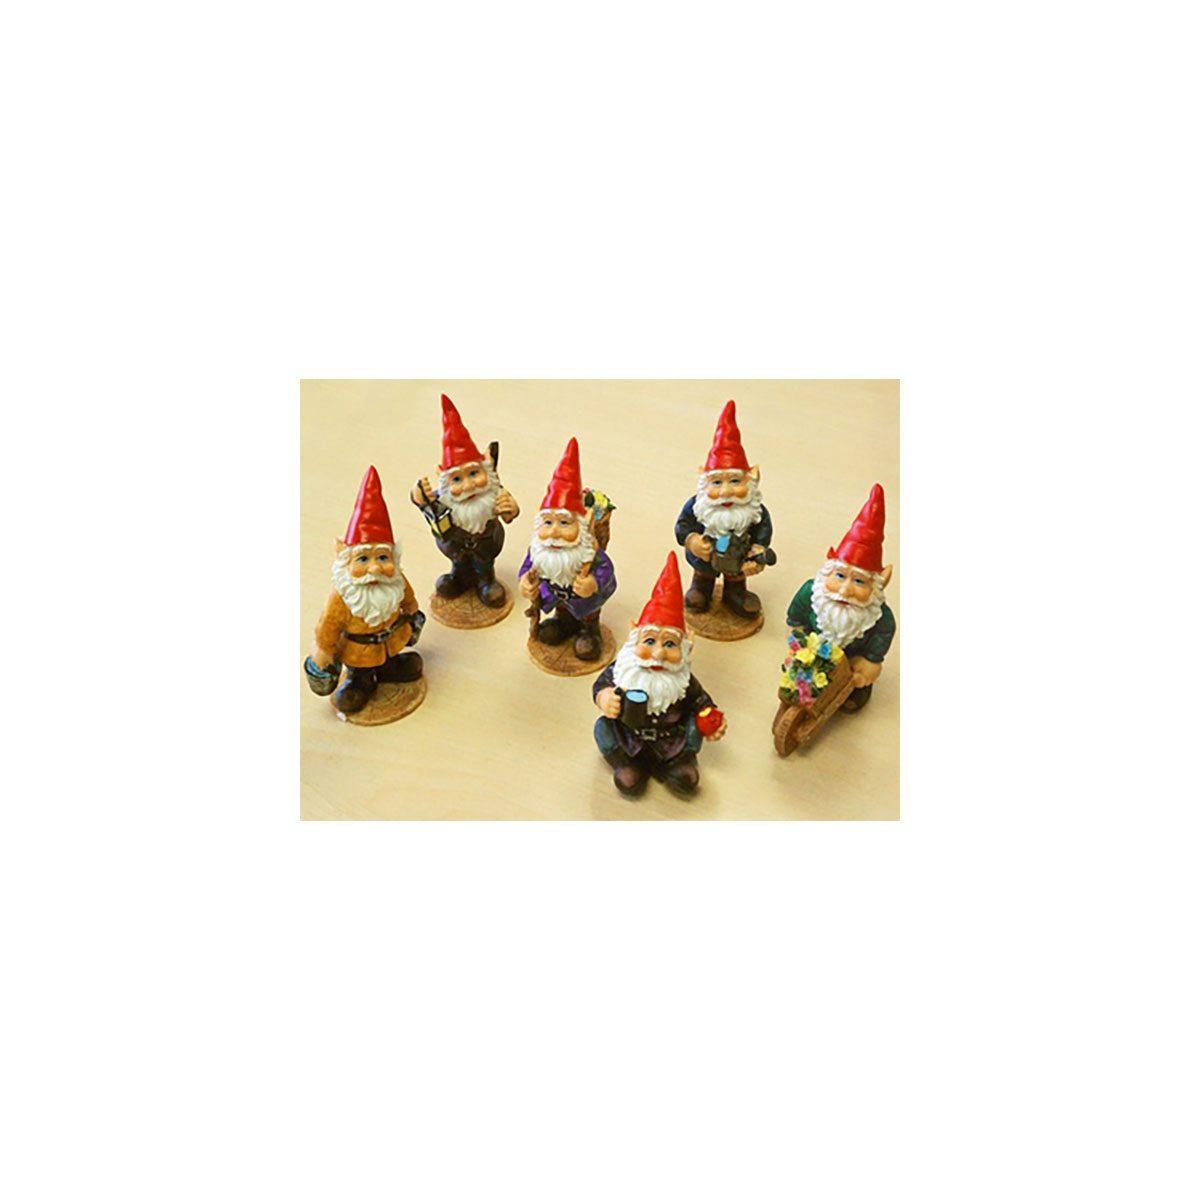 Six mini garden gnomes